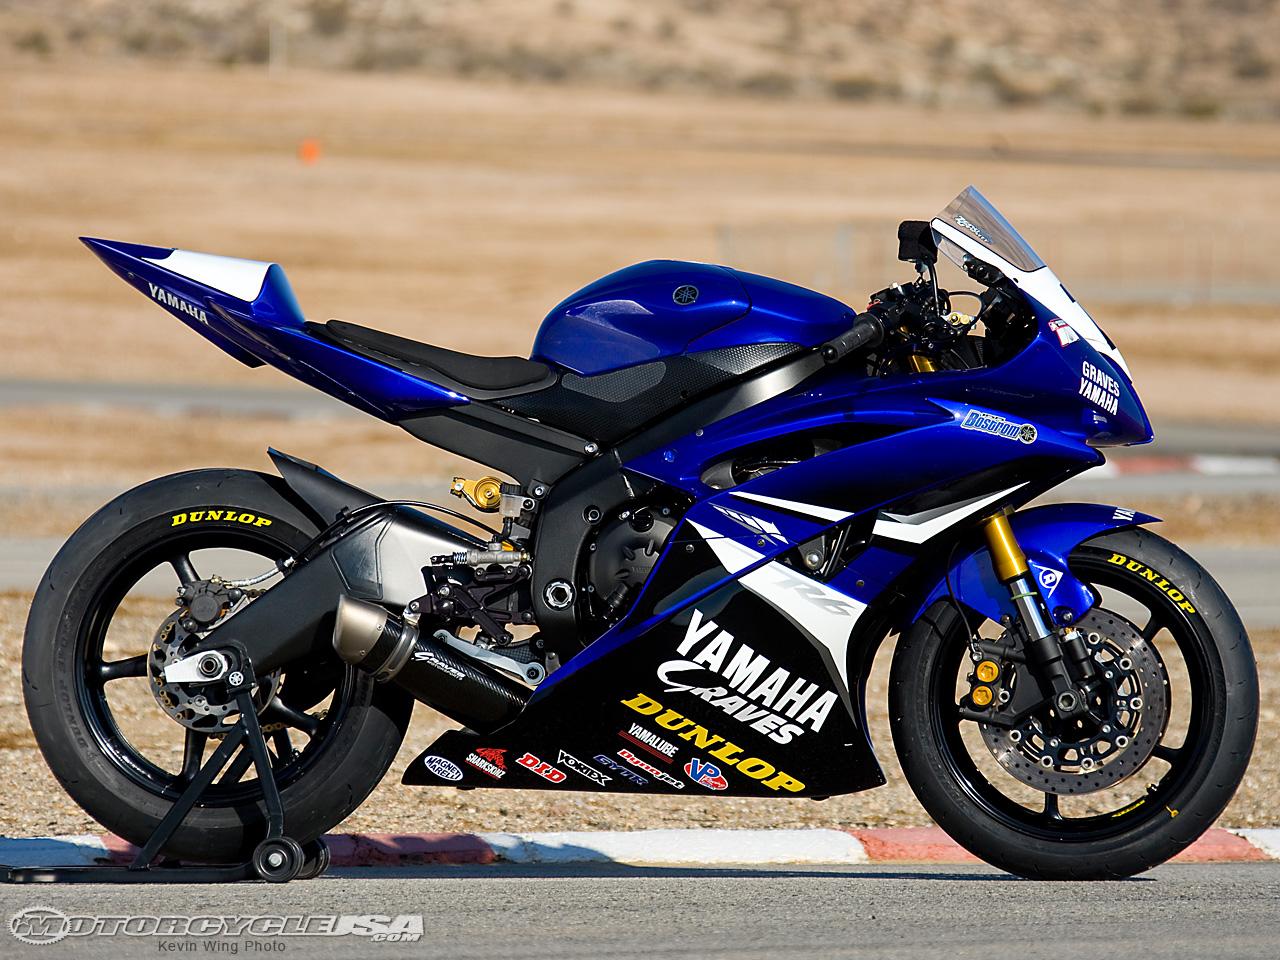 Yamaha Gb